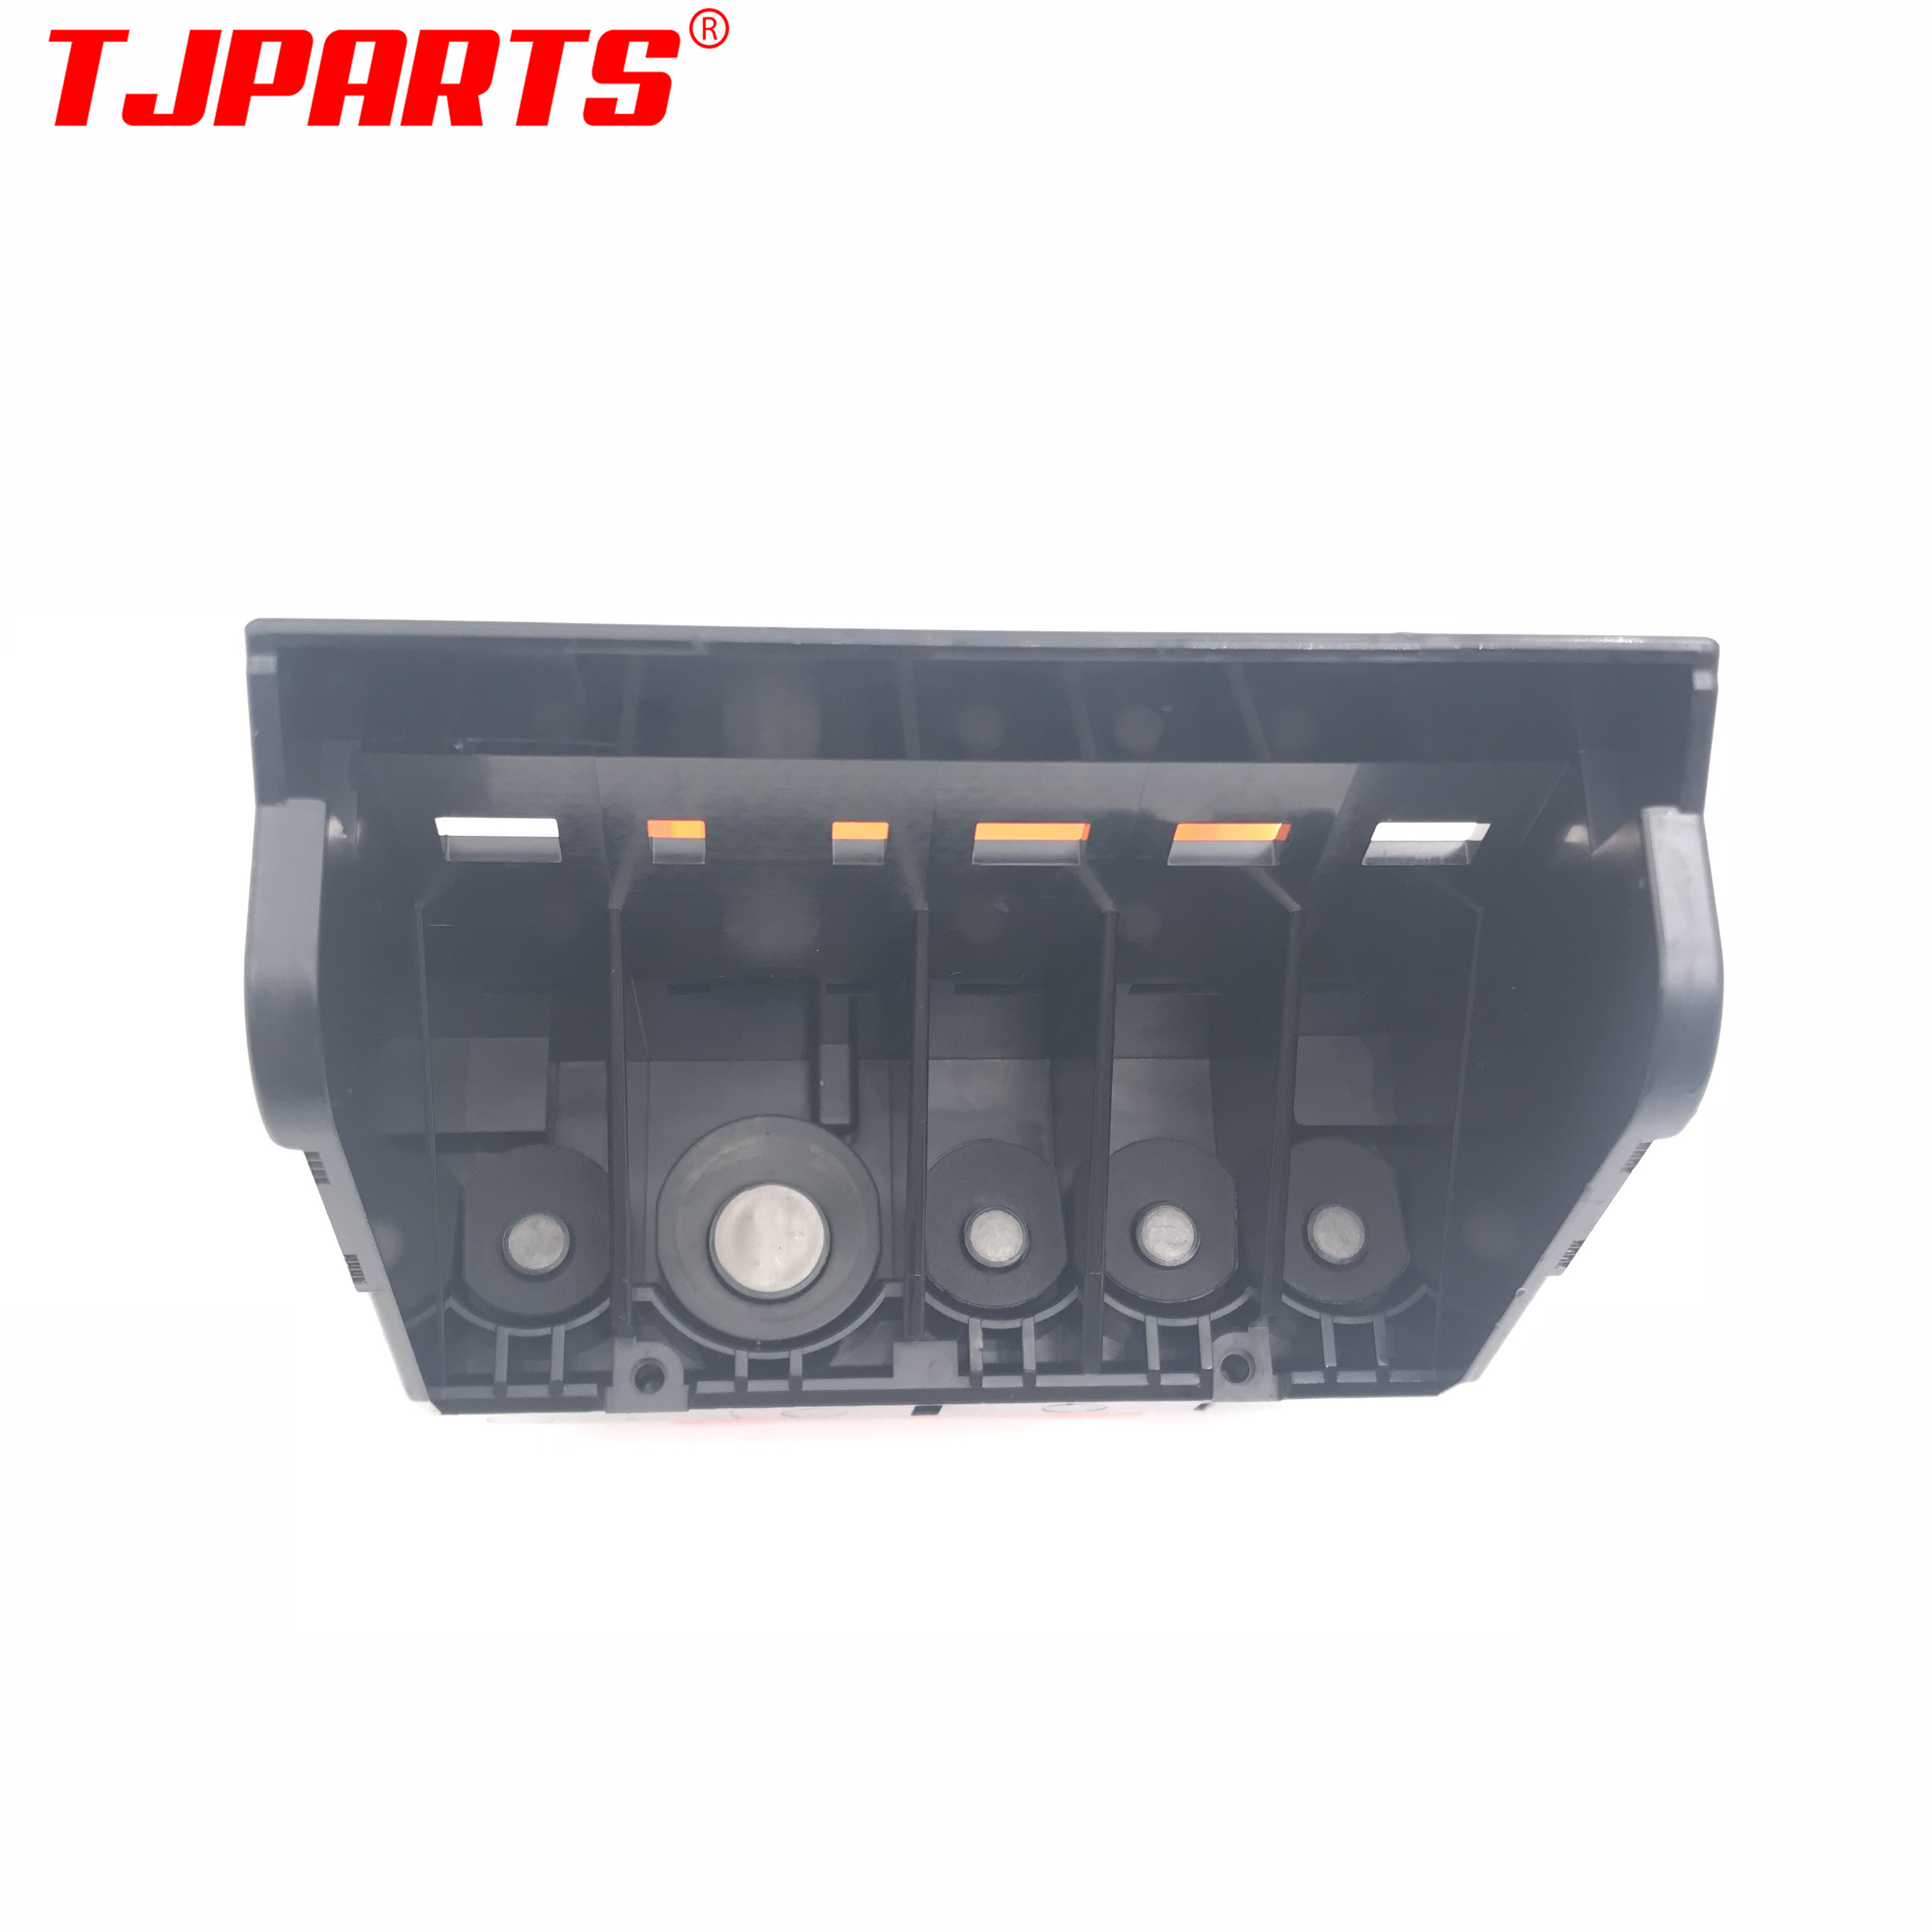 1PCX ORIGINAL QY6 0057 QY6 0057 000 Printhead Print Head Printer Head for Canon PIXMA iP5000